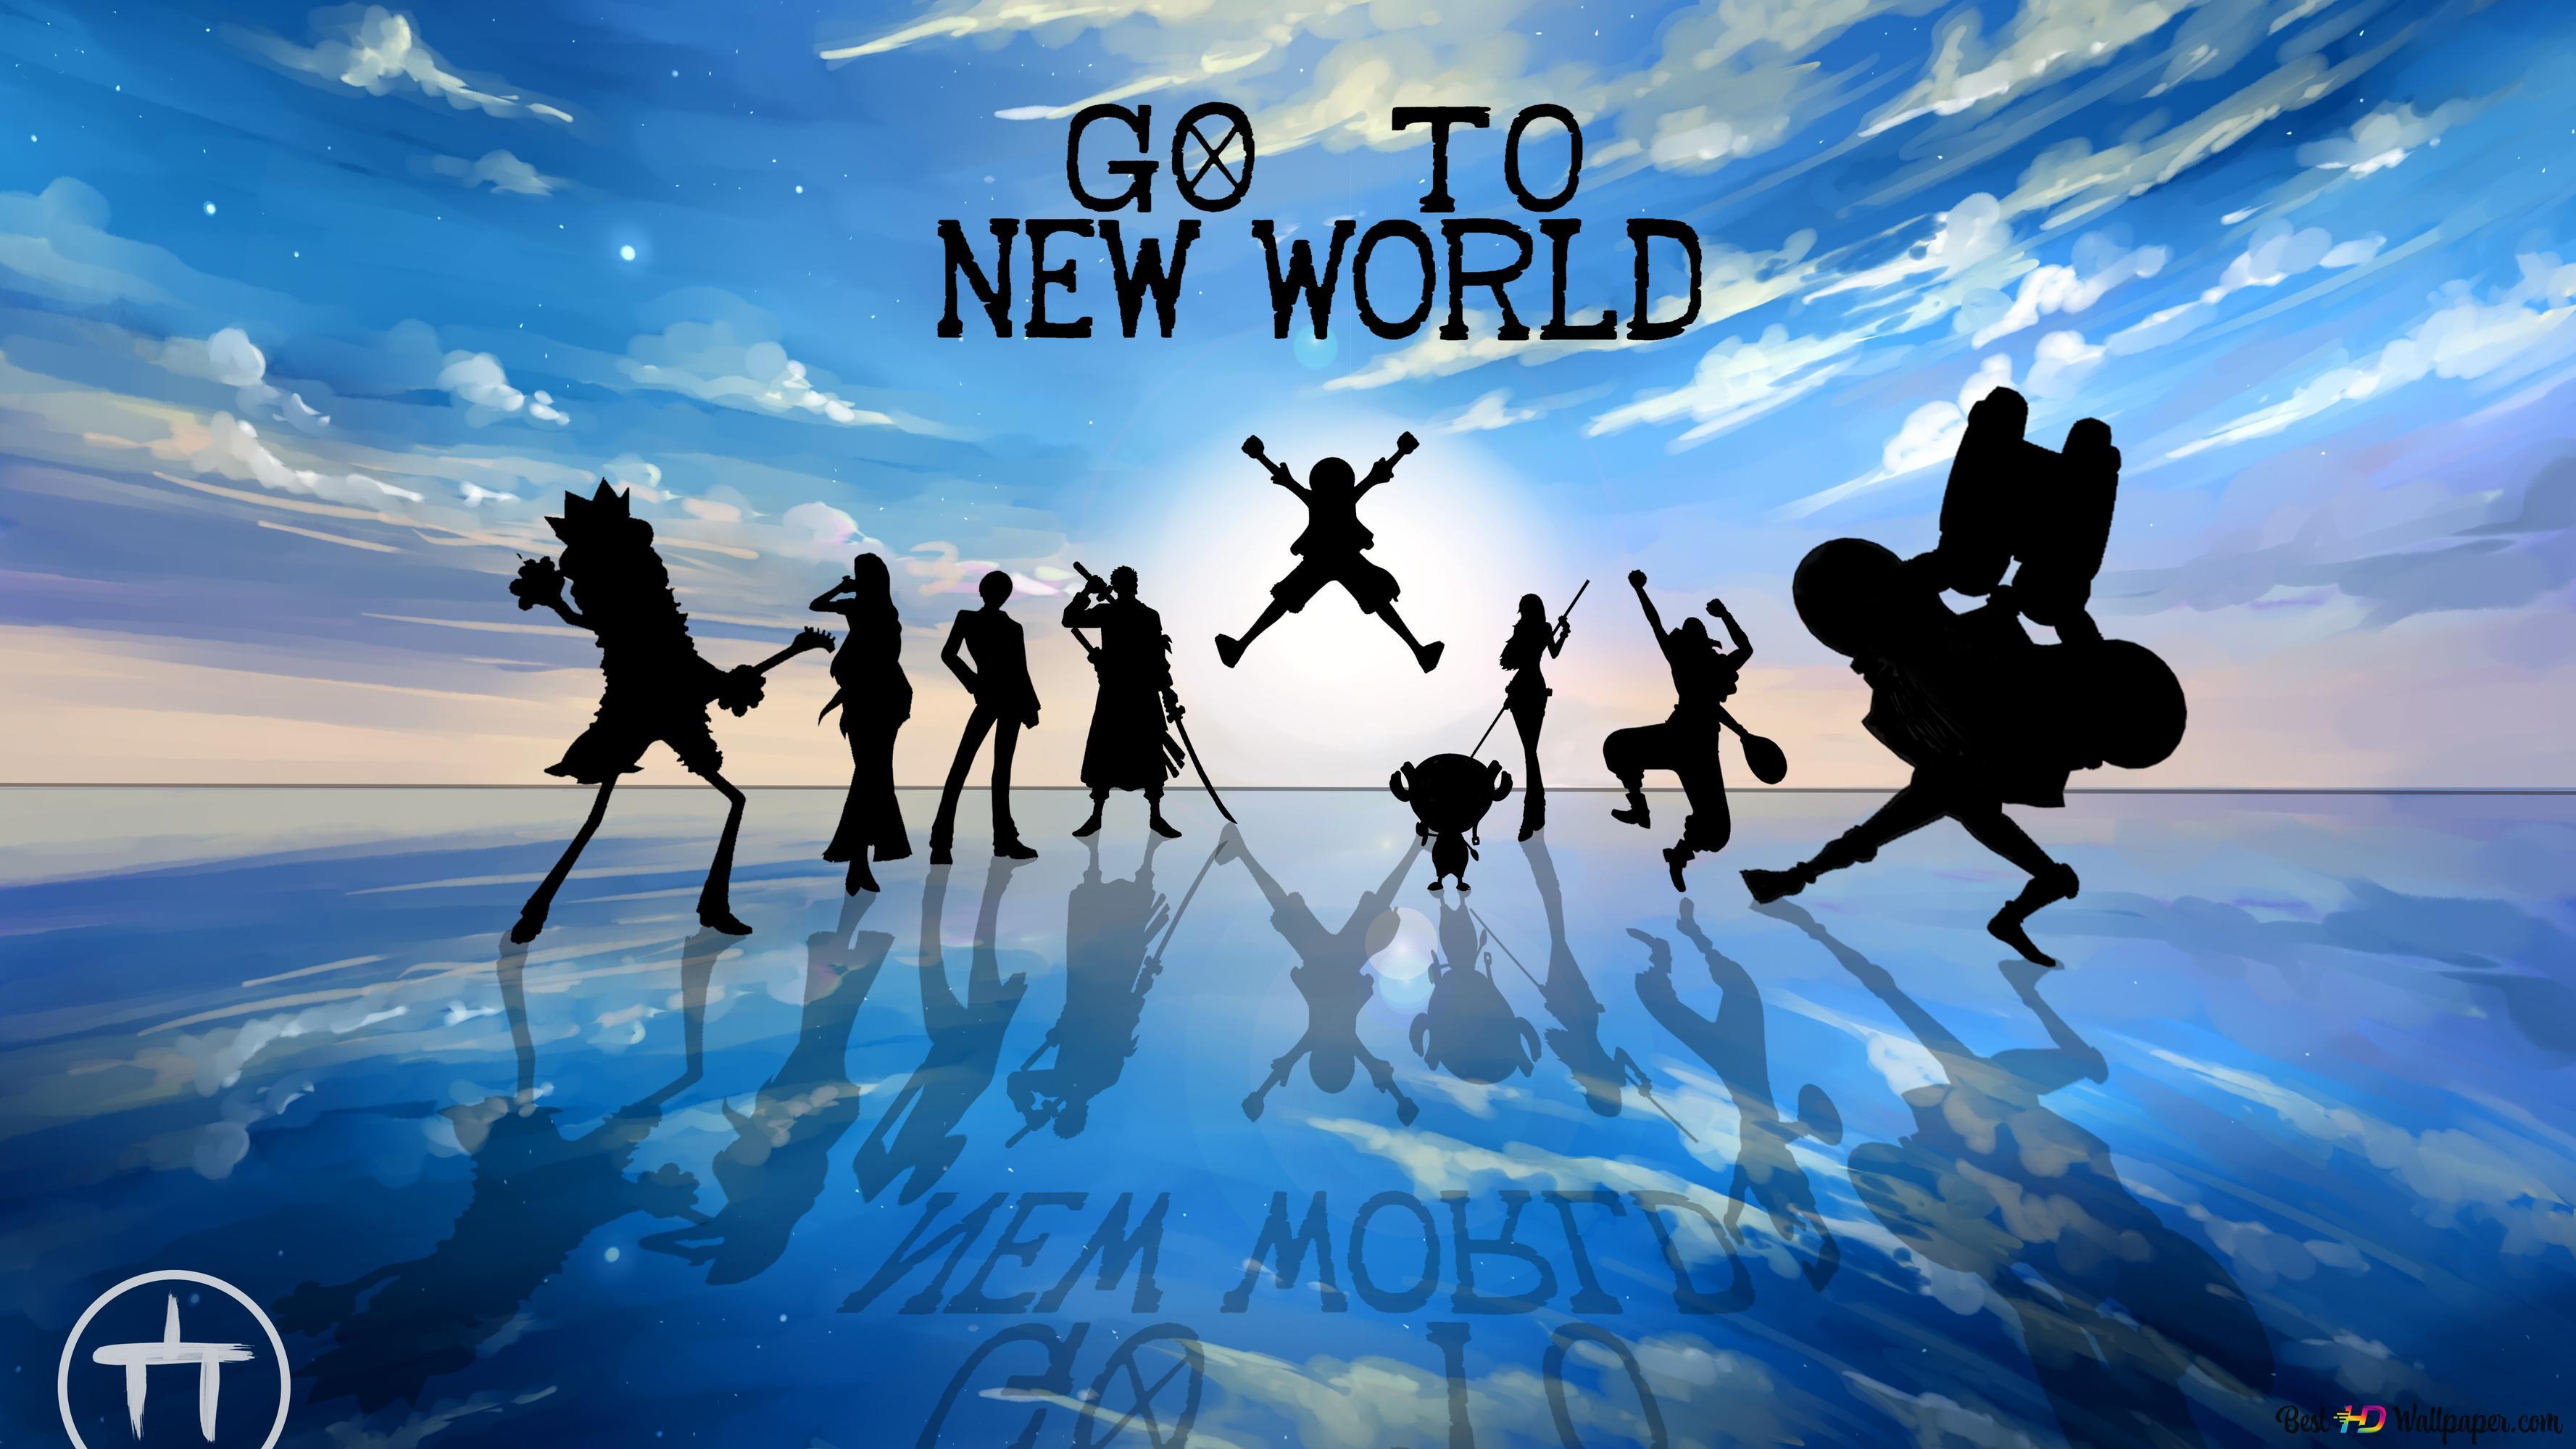 One Piece Go To New World 4k Unduhan Wallpaper Hd